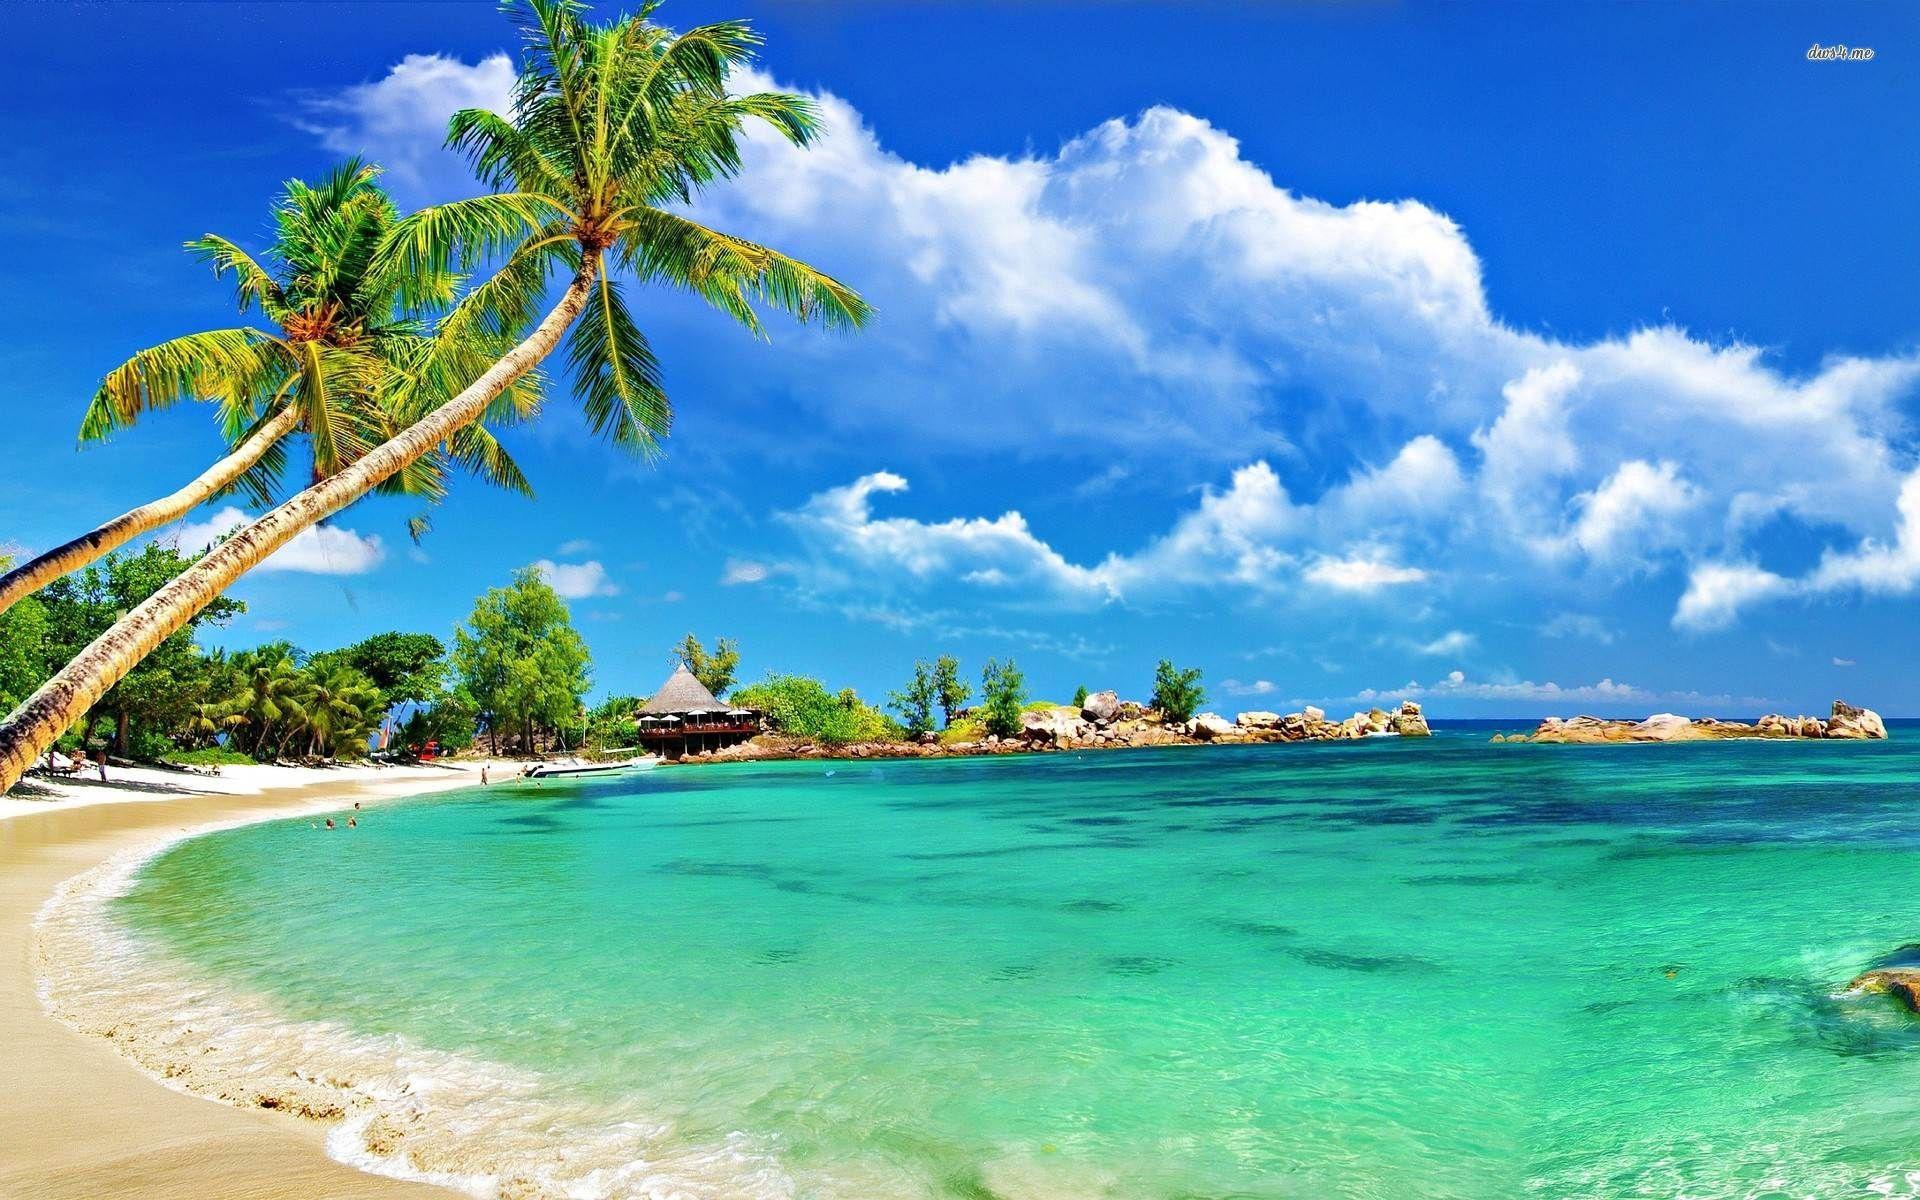 Tropical Island Desktop Wallpapers Wallpaper 1999 1333 Tropical Island Adorable Wallpapers Beach Background Beach Wallpaper Tropical Island Beach